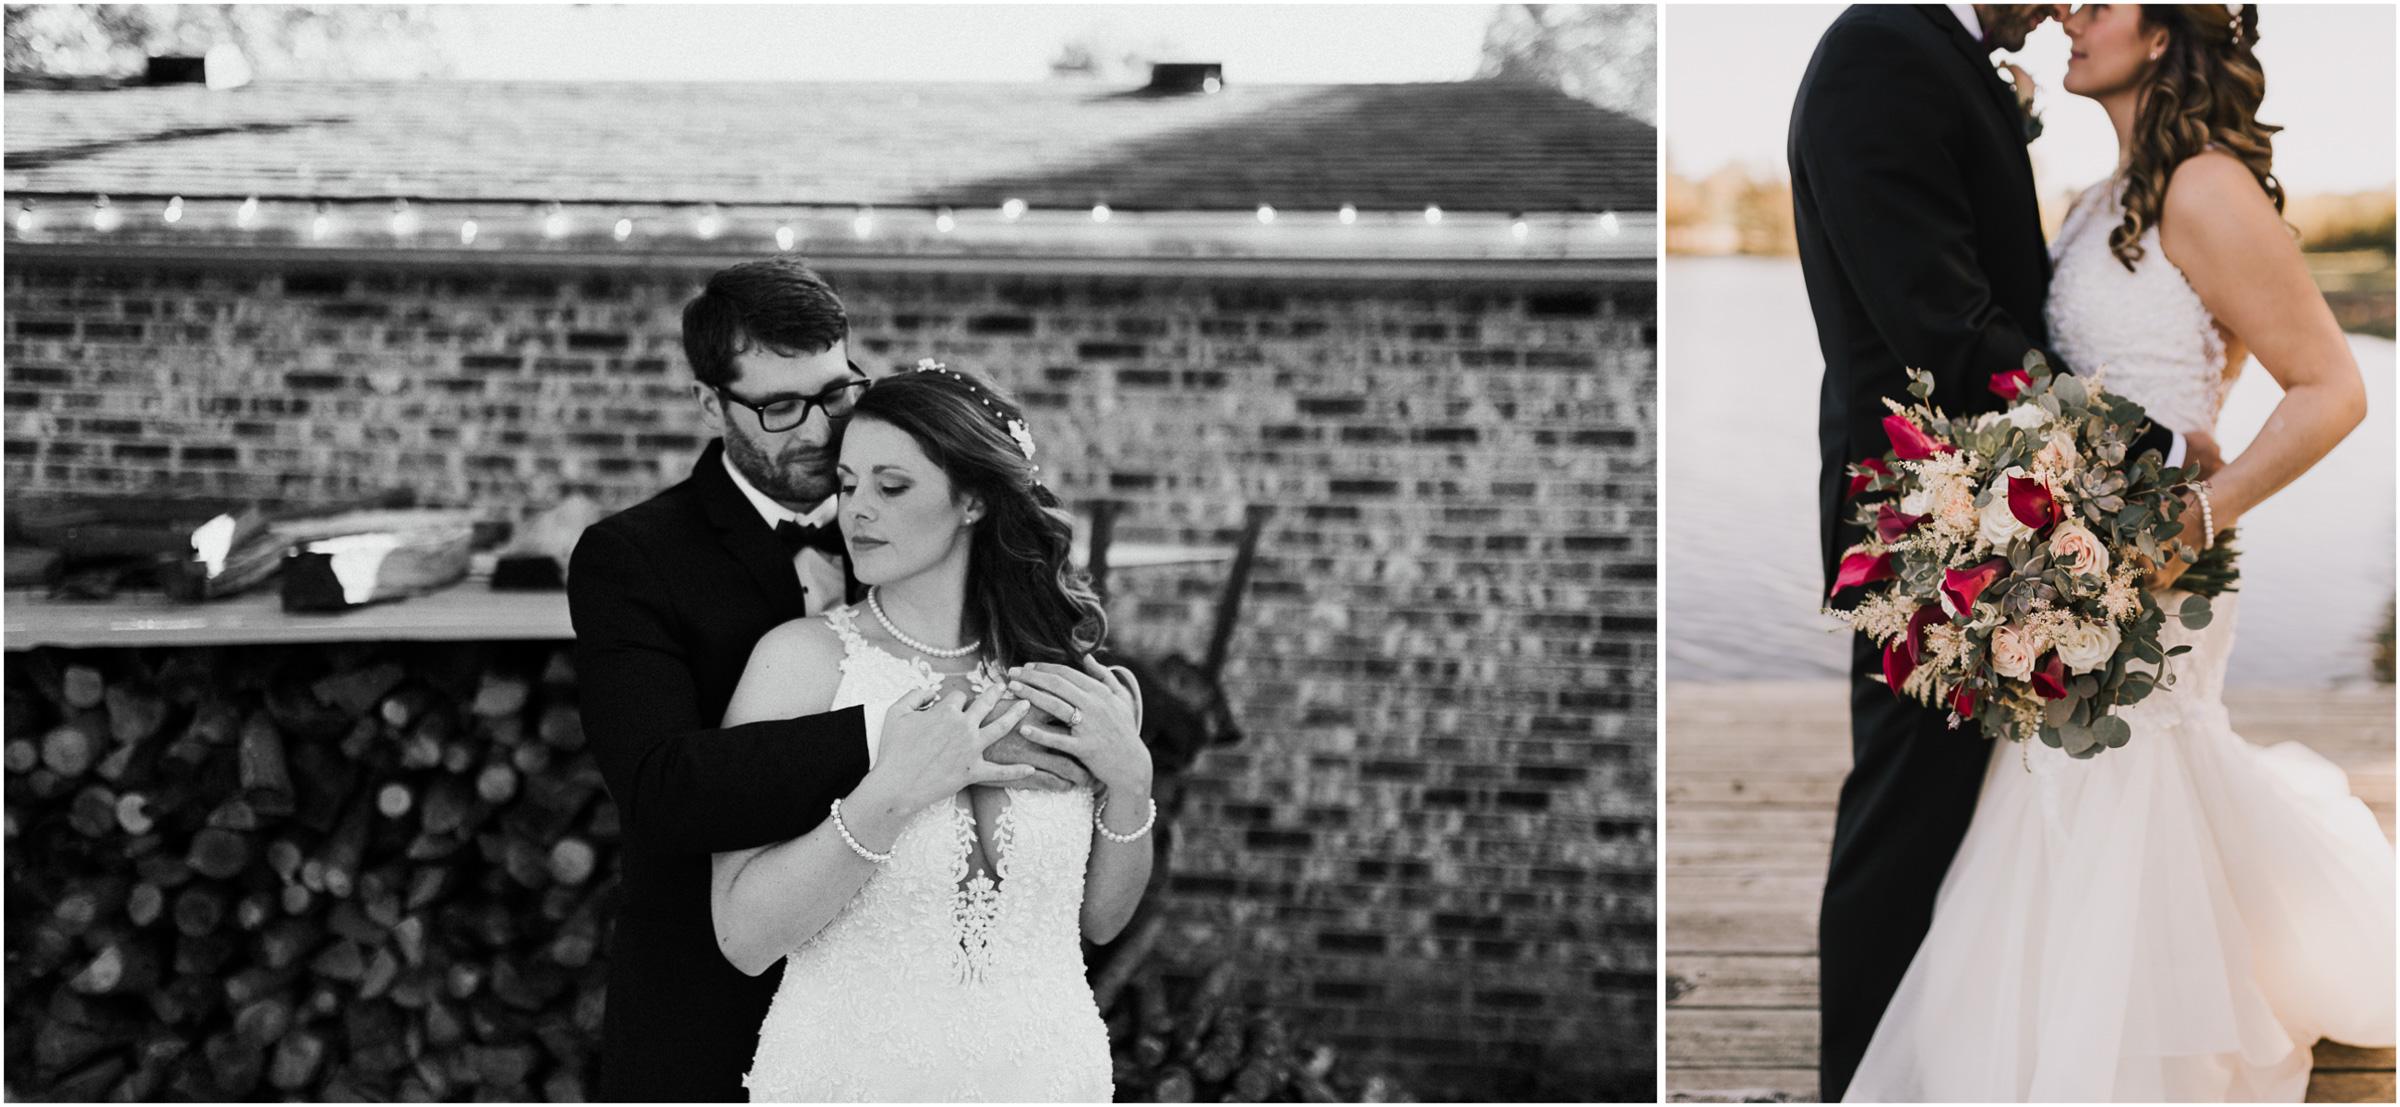 alyssa barletter photography intimate fall autumn wedding rural missouri wedding photographer-17.jpg